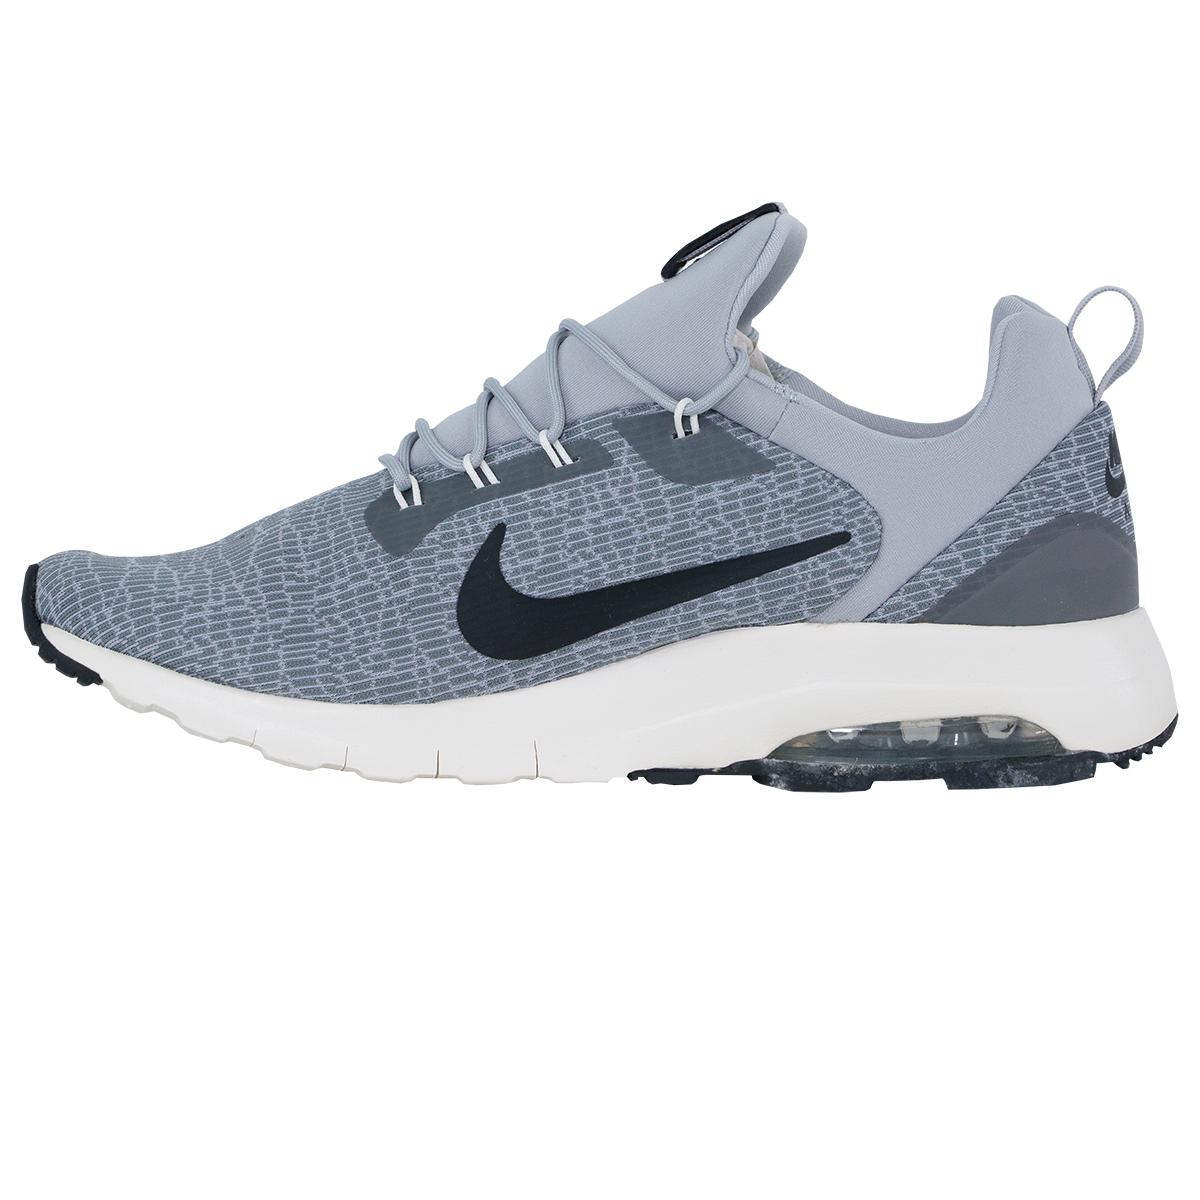 Nike-Men-039-s-Air-Max-Motion-Racer-Running-Shoes thumbnail 6